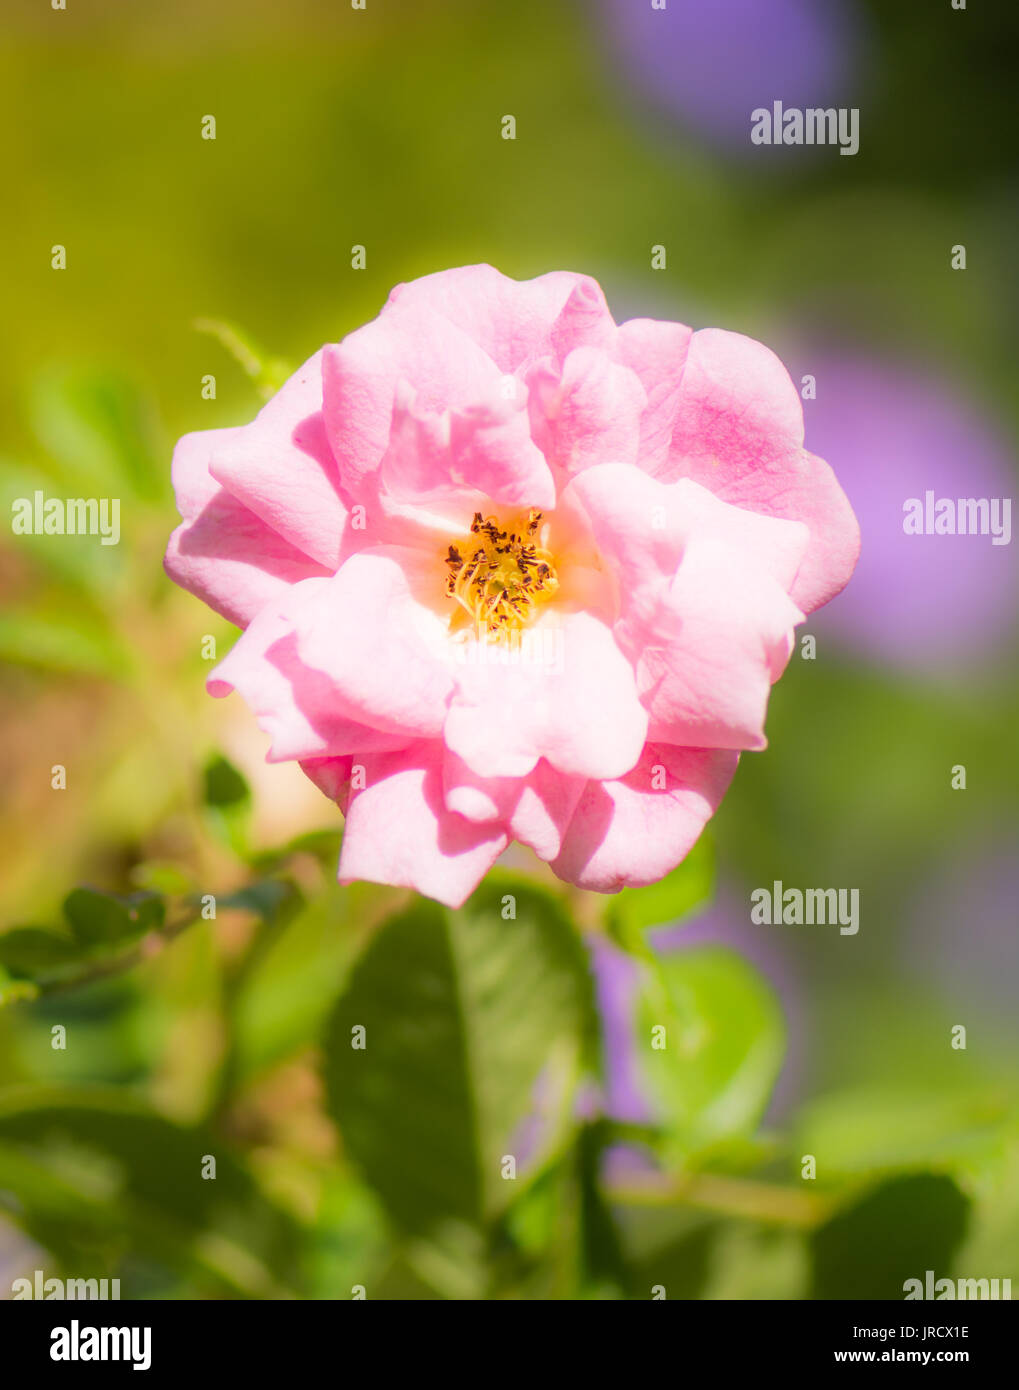 Closeup of a pink rambler rose blossom - Stock Image